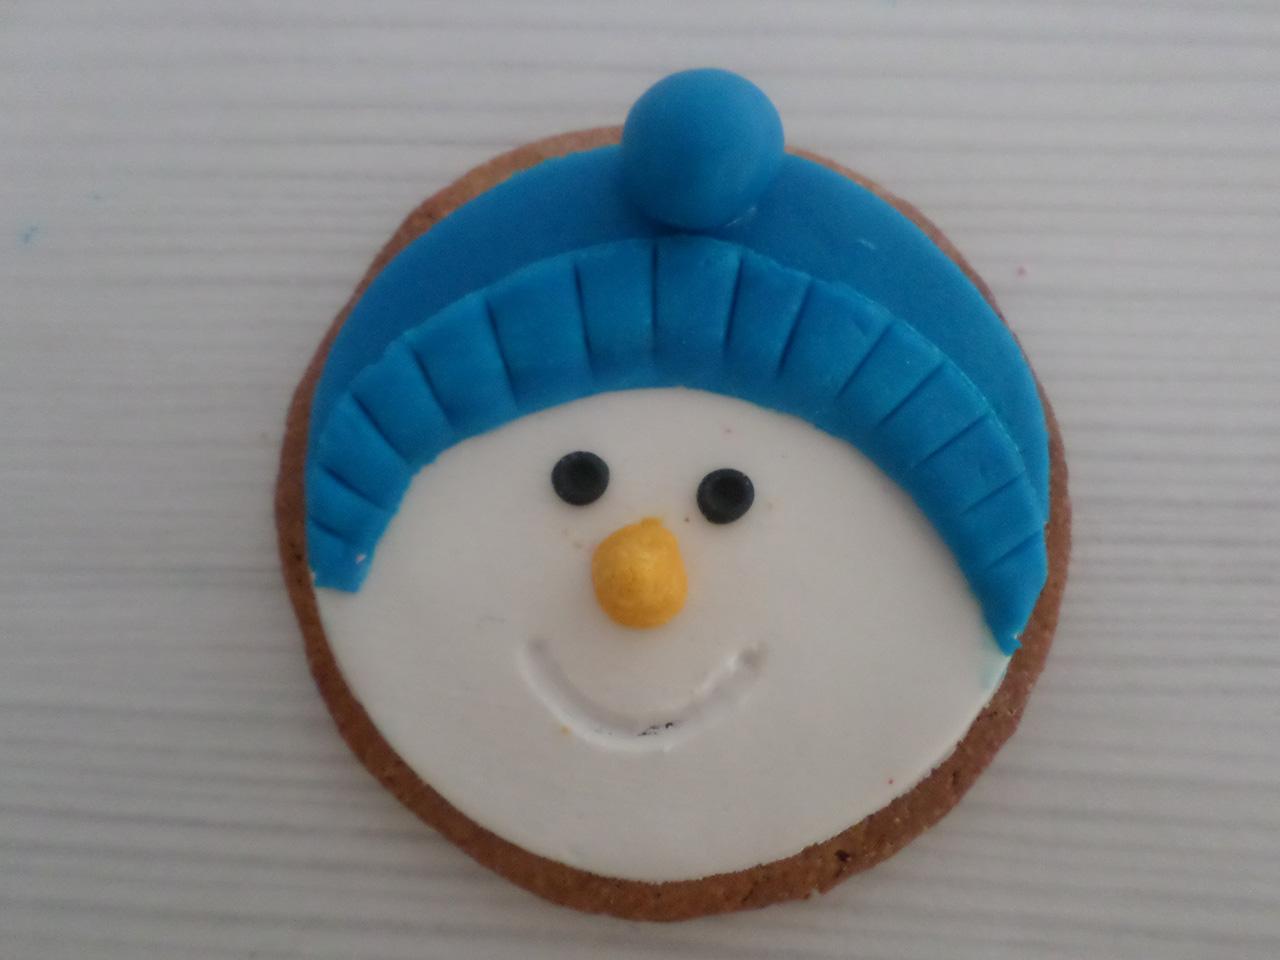 diy-biscoito-boneco-neve